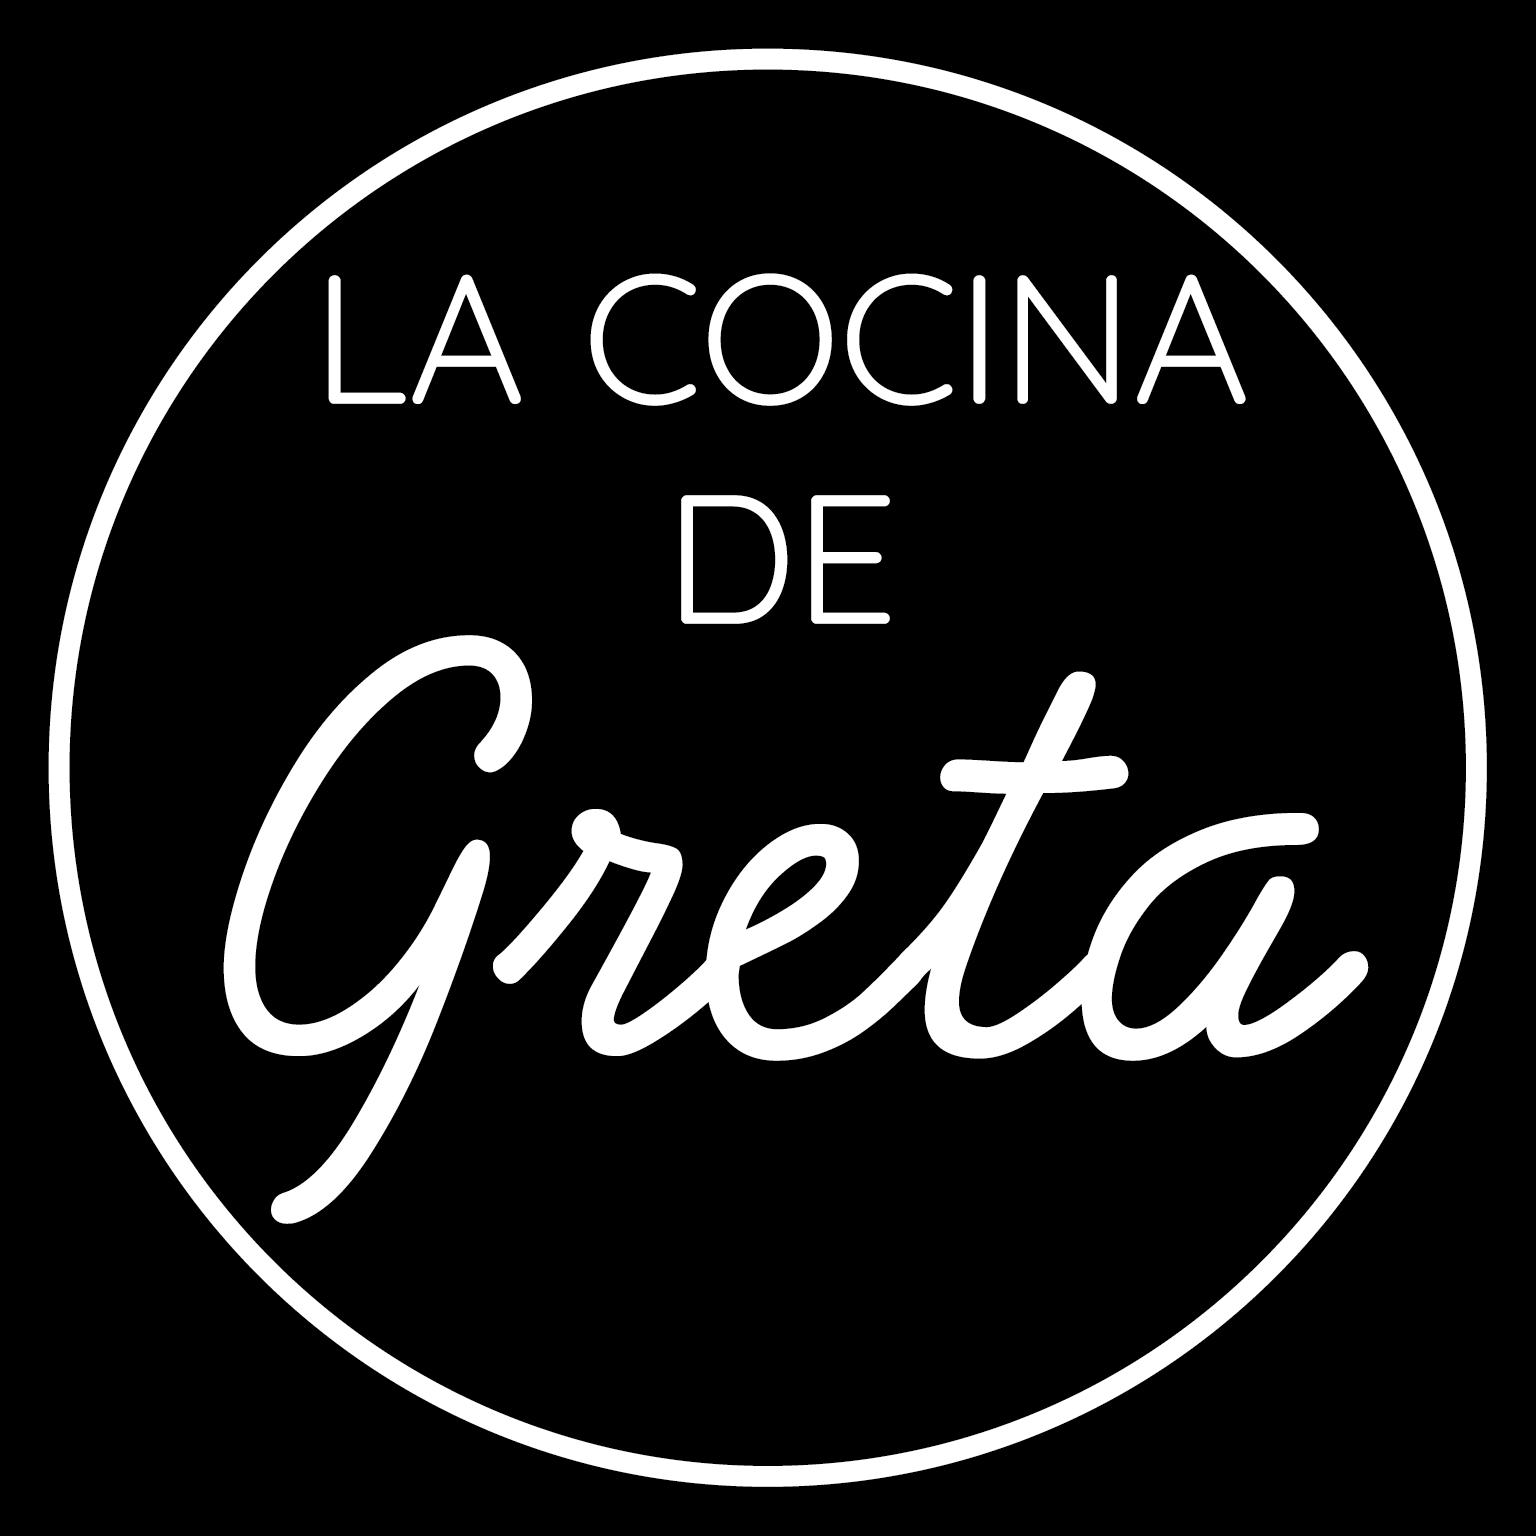 La Cocina de Greta